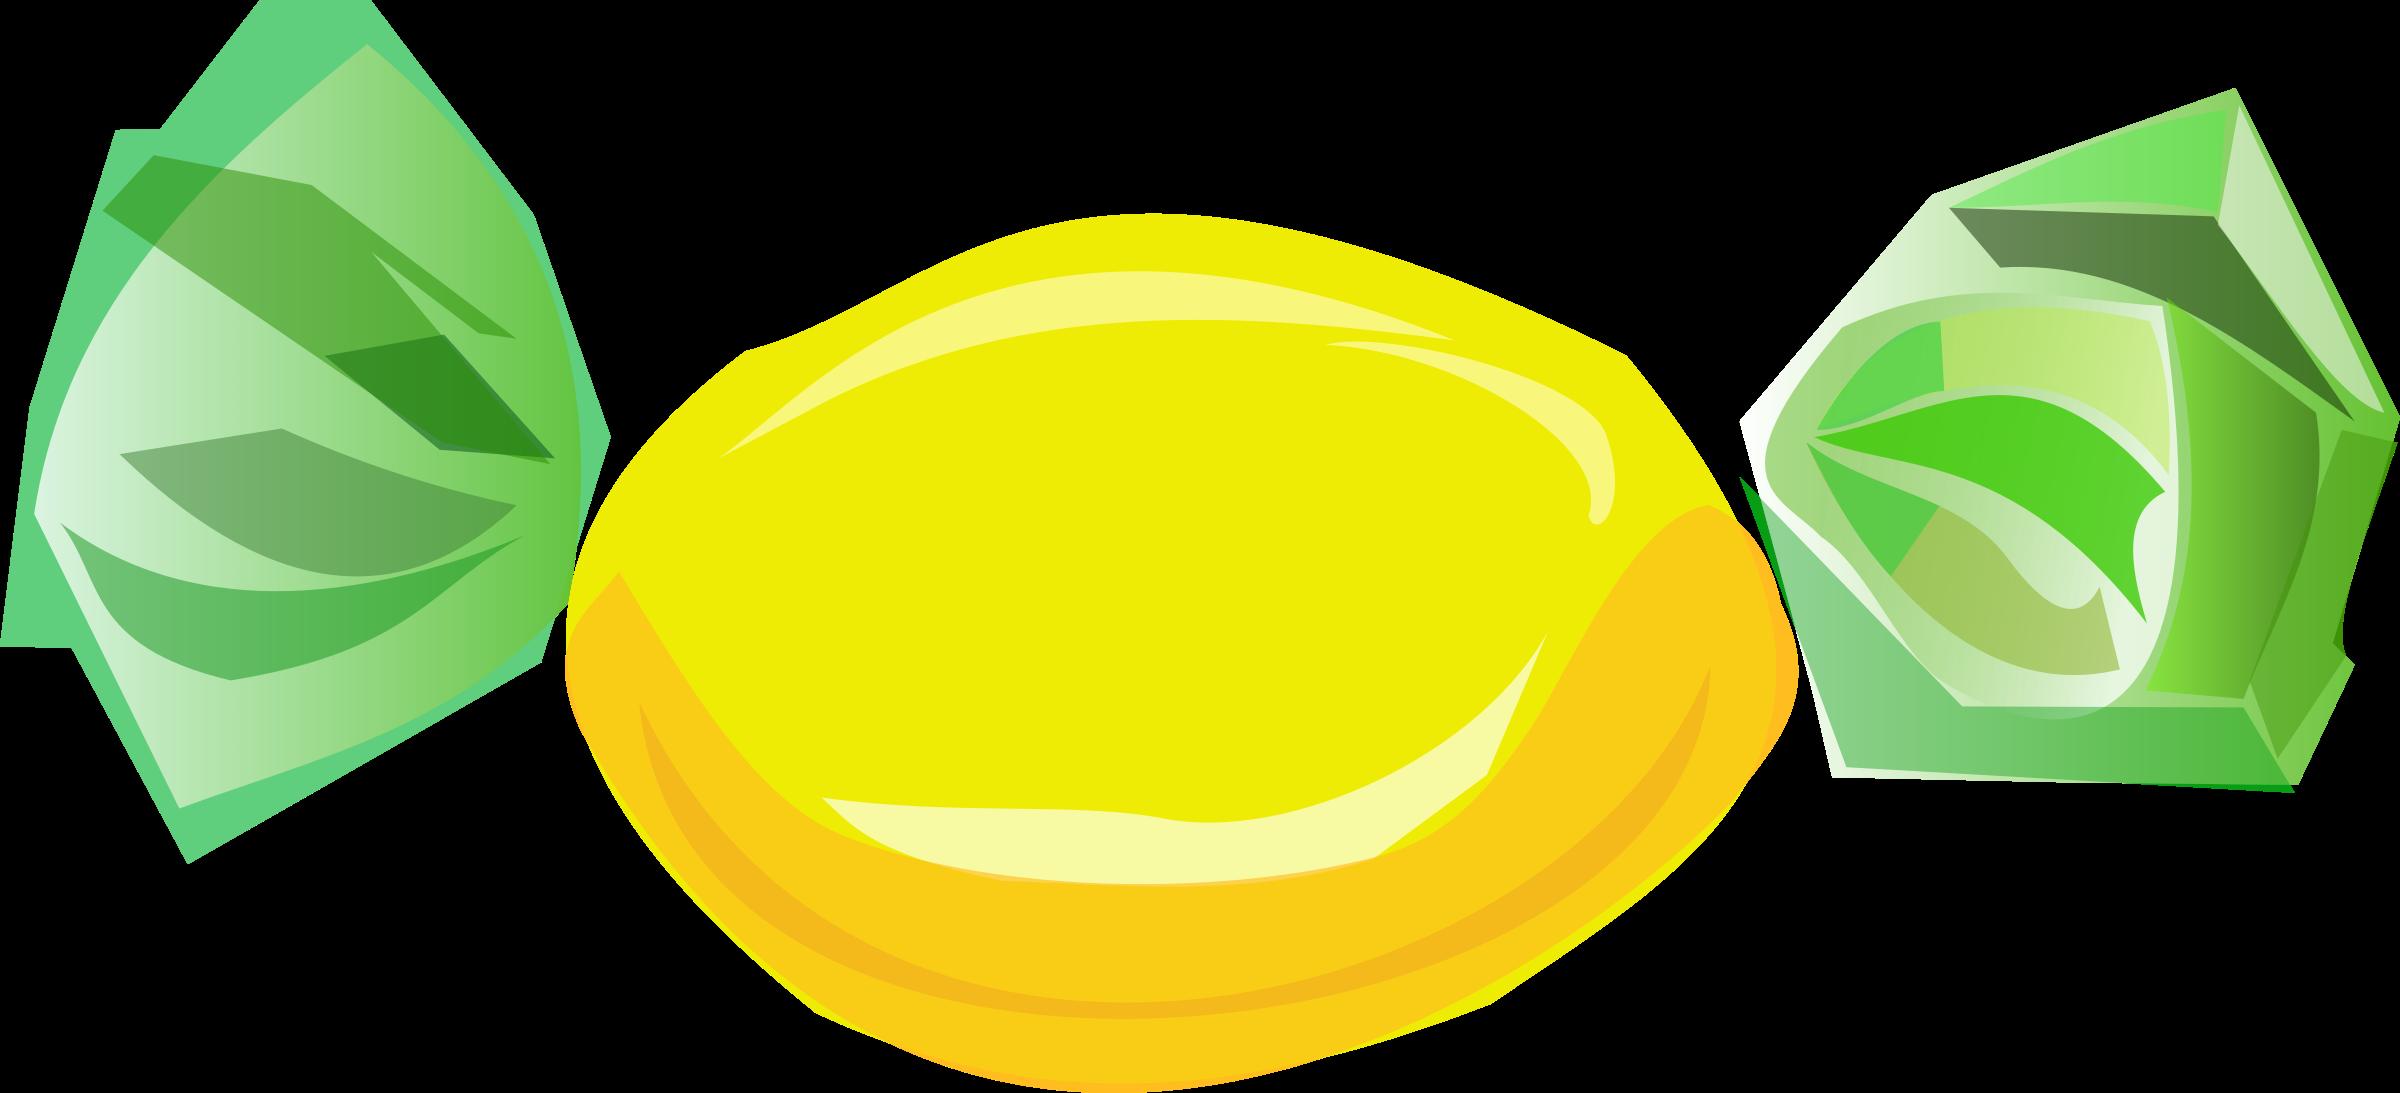 Yellow Sweet PNG Image